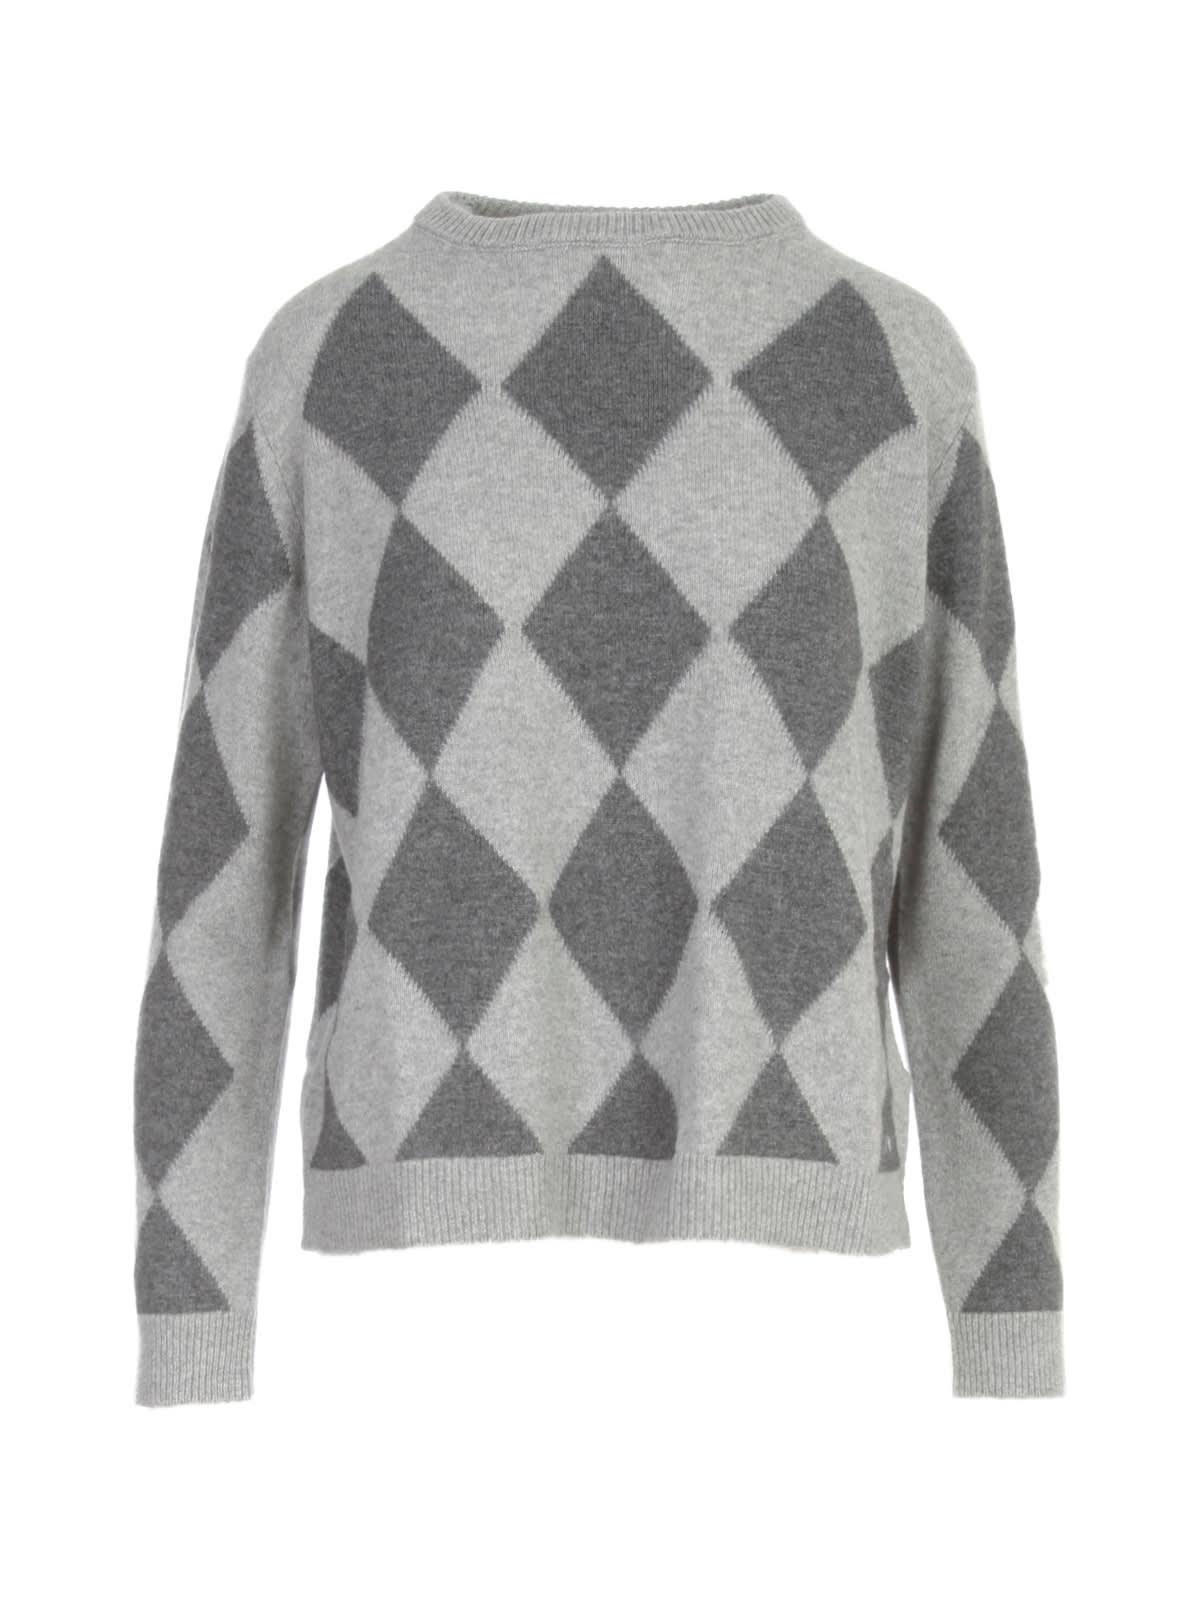 Bicolored Rhombus Printing Sweater